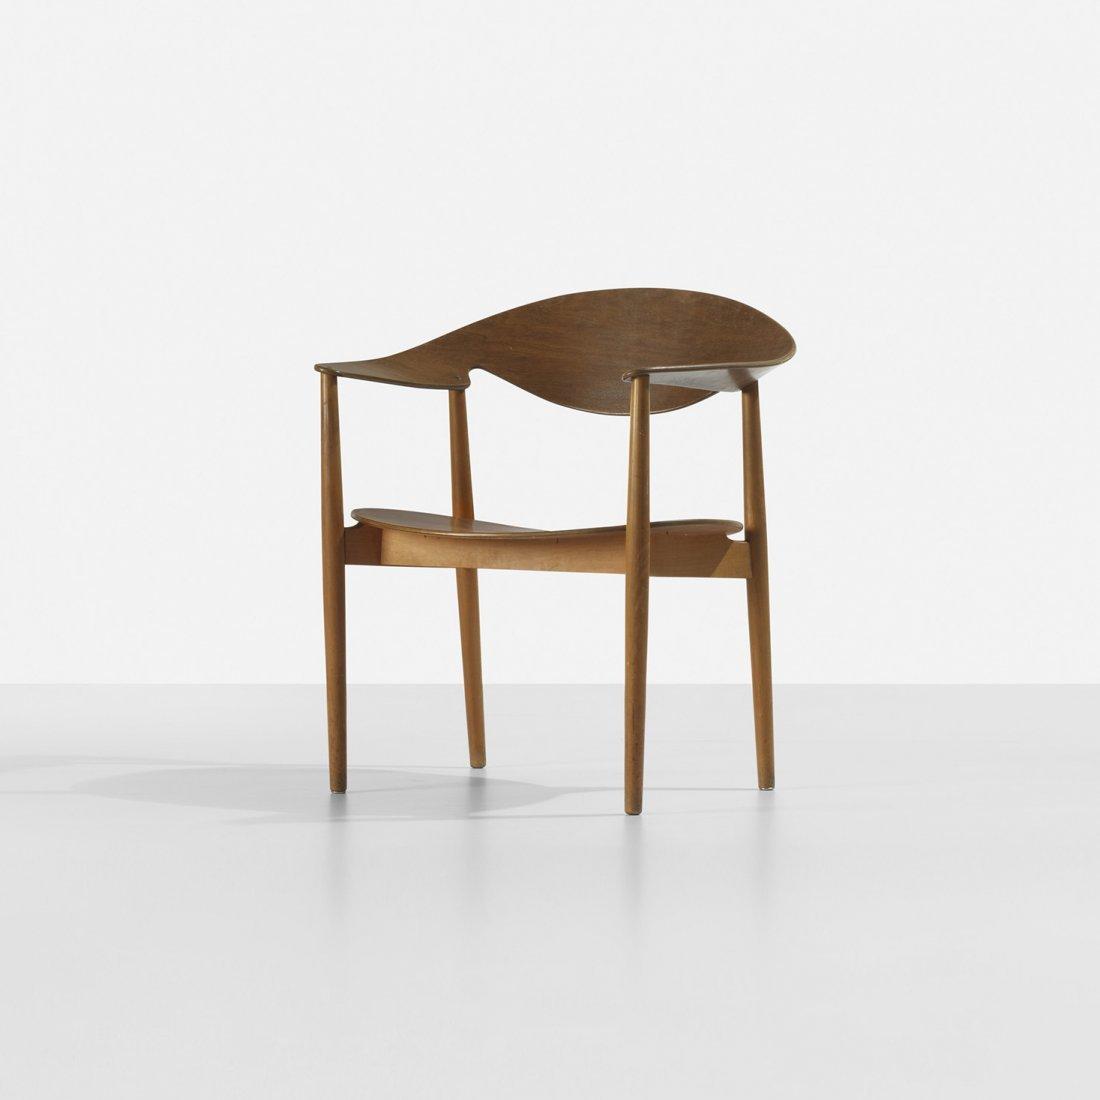 106: A. Bender Madsen and Ejner Larsen armchair